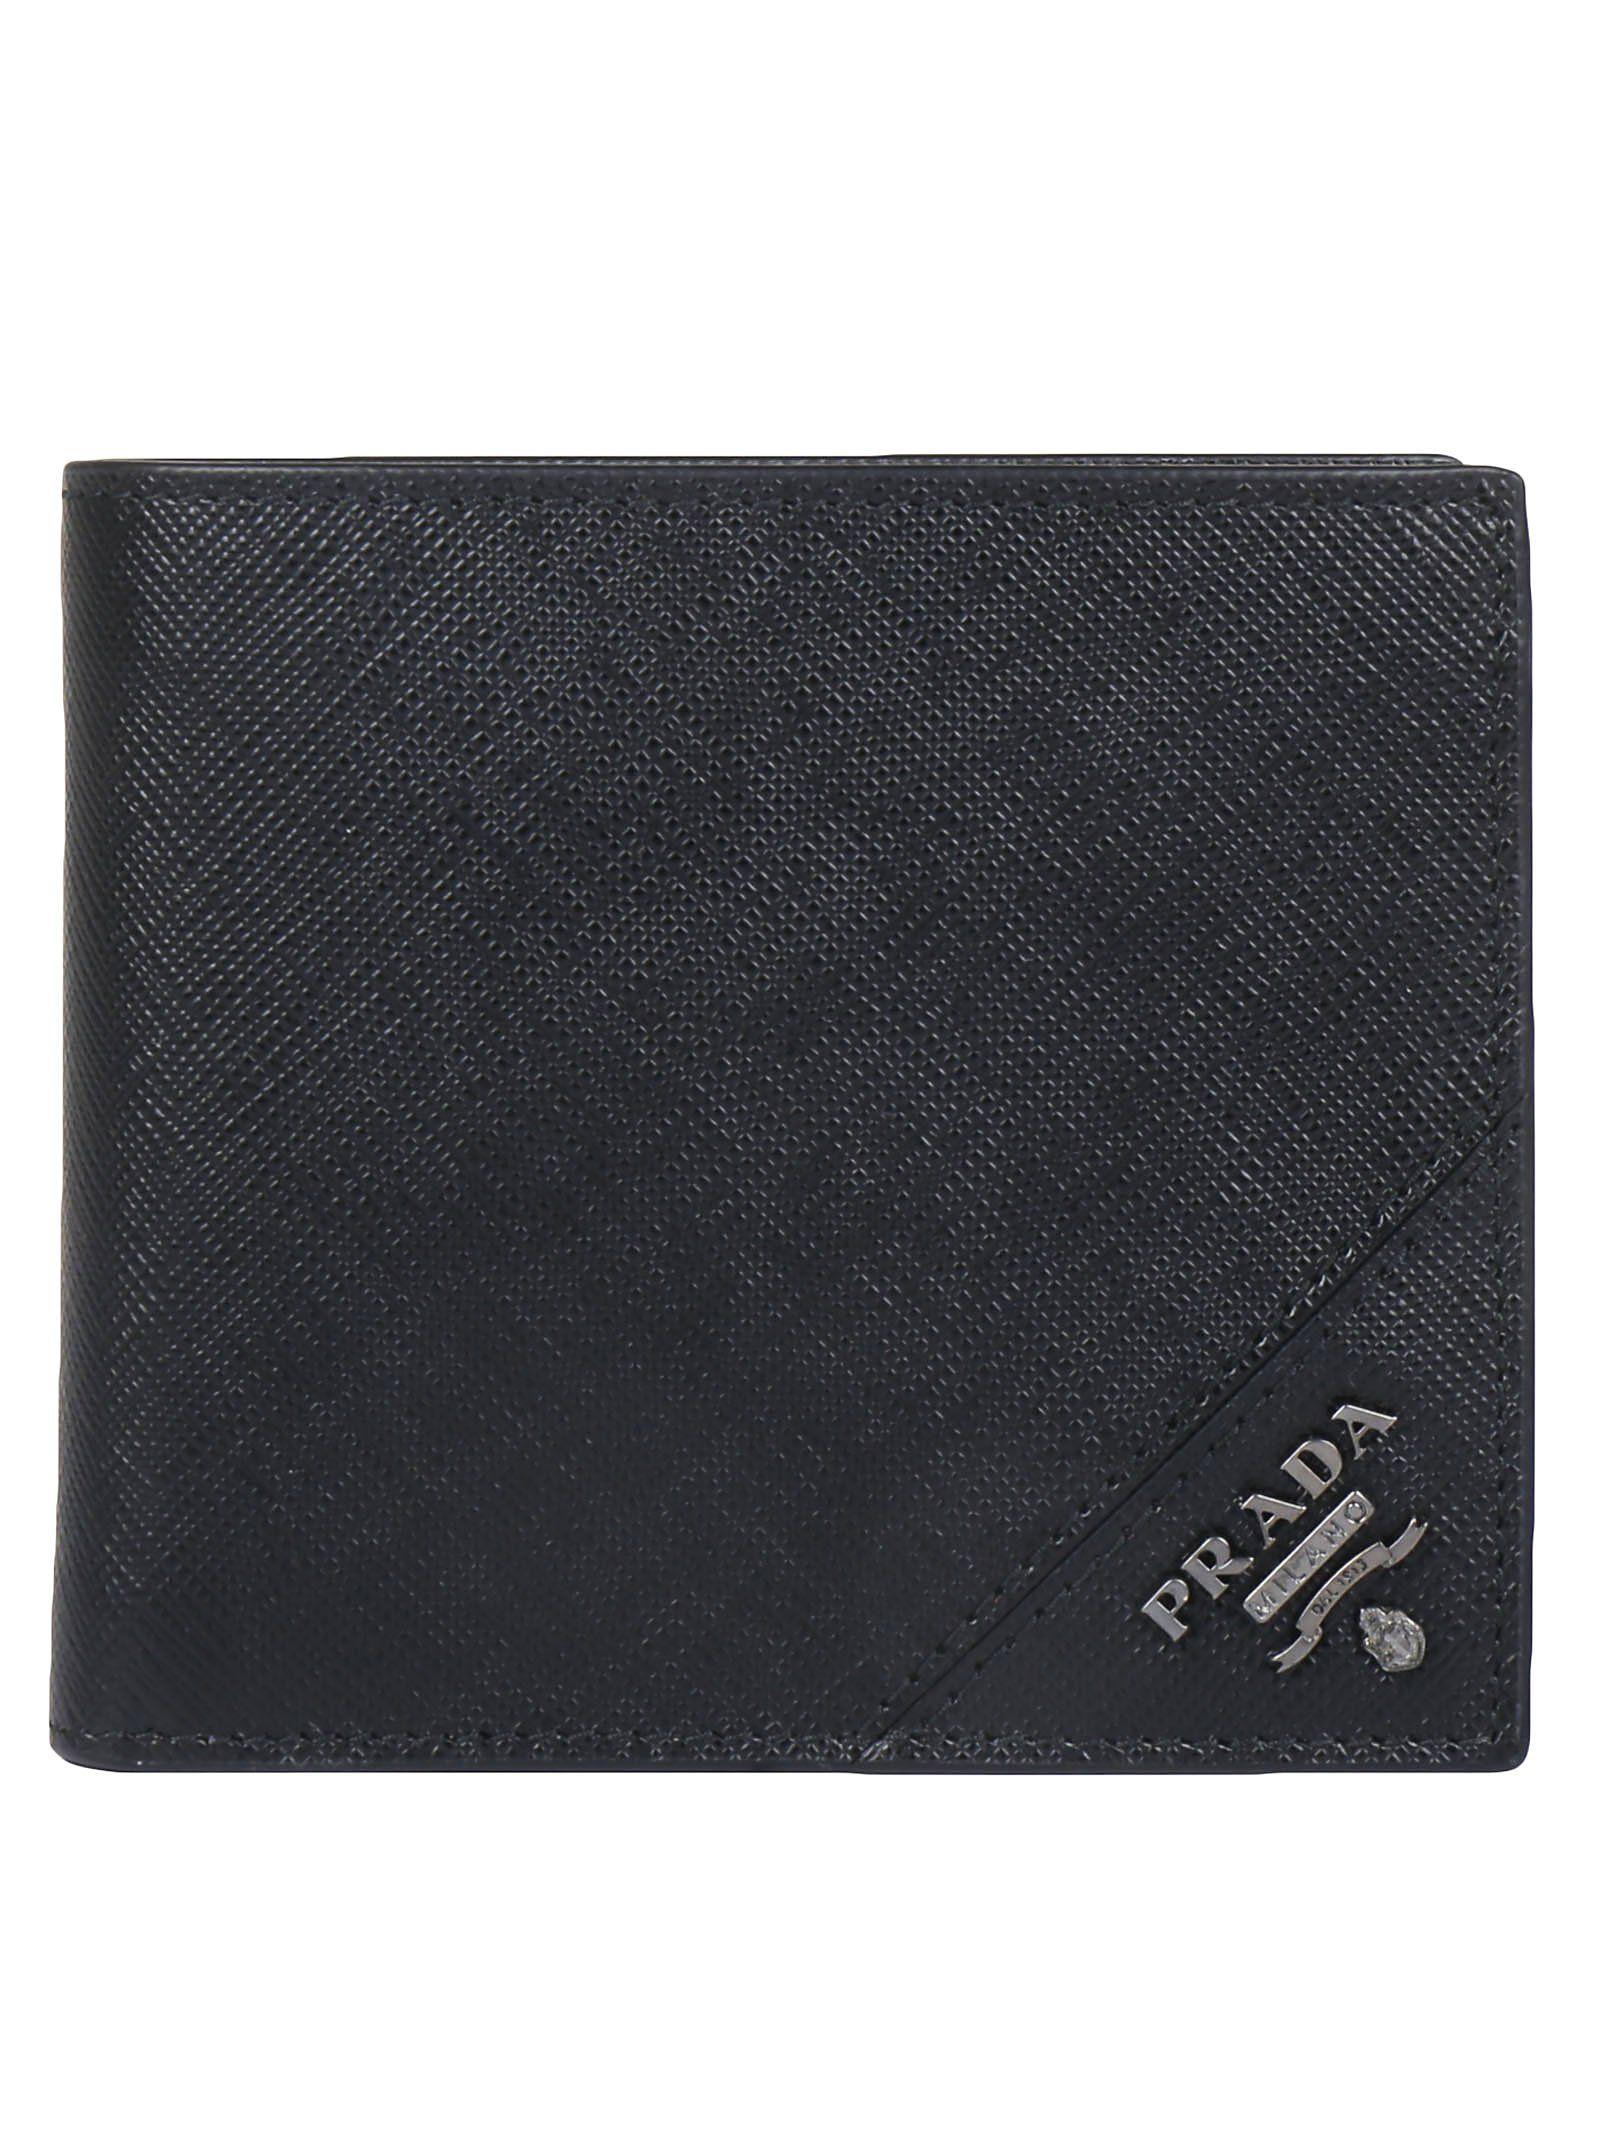 Prada Wallet Prada Wallet Bifold Plaqueta Bifold Logo Plaqueta Prada Logo Logo ZOvwddqT